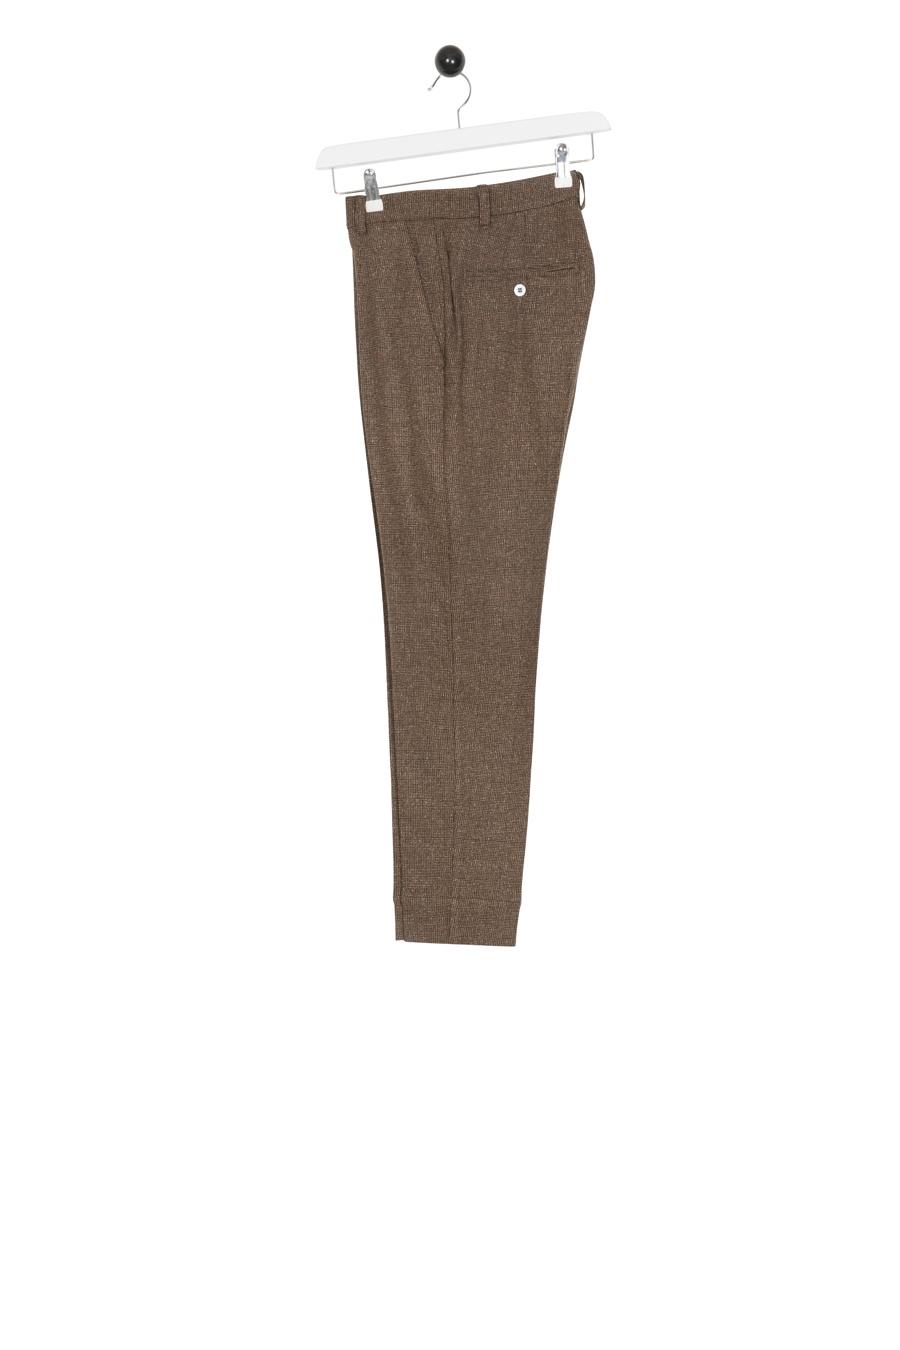 Grevlunda Trousers C